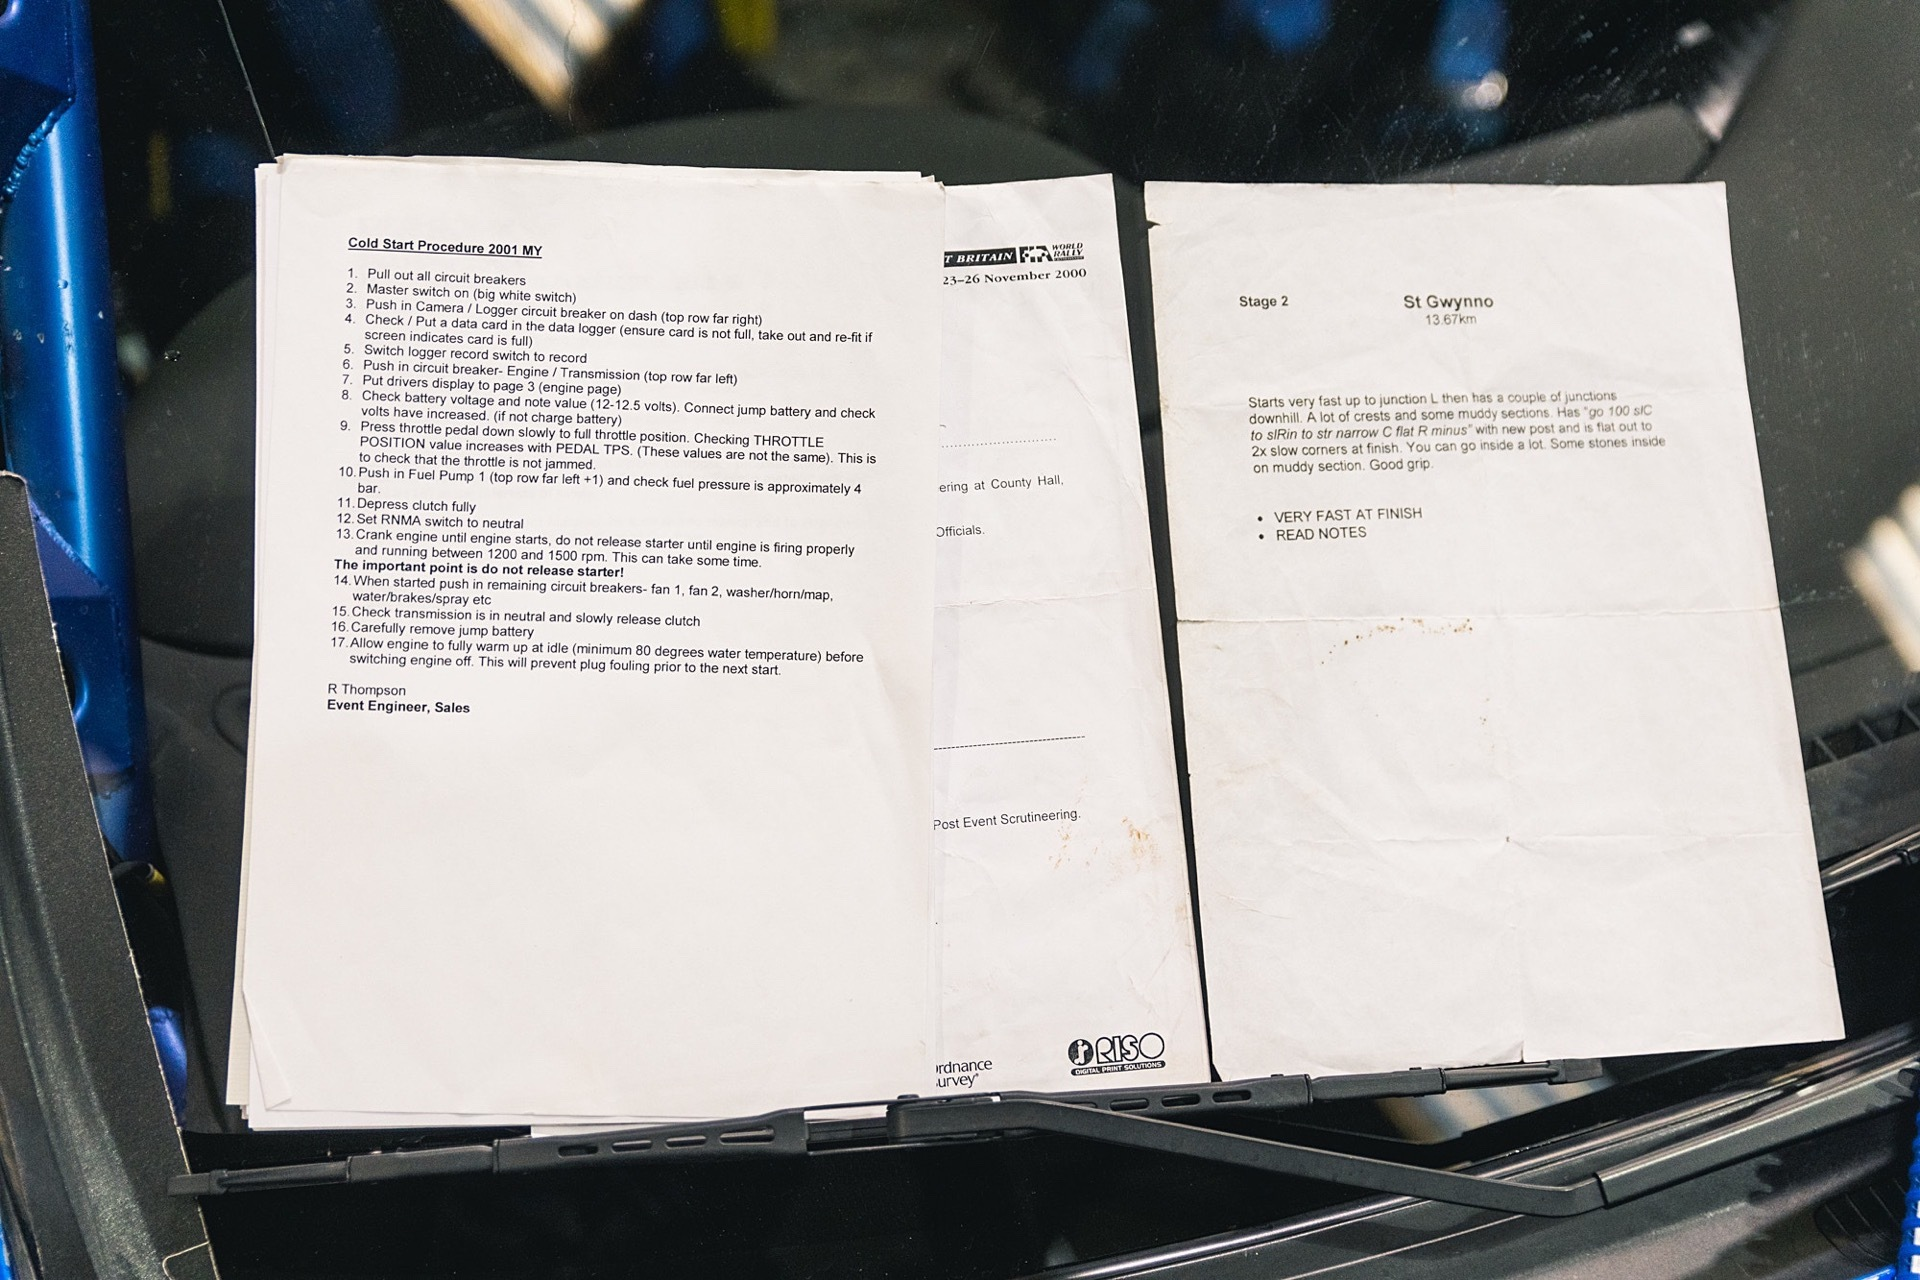 Richard_Burns_Subaru_Impreza_WRC_sale-0002